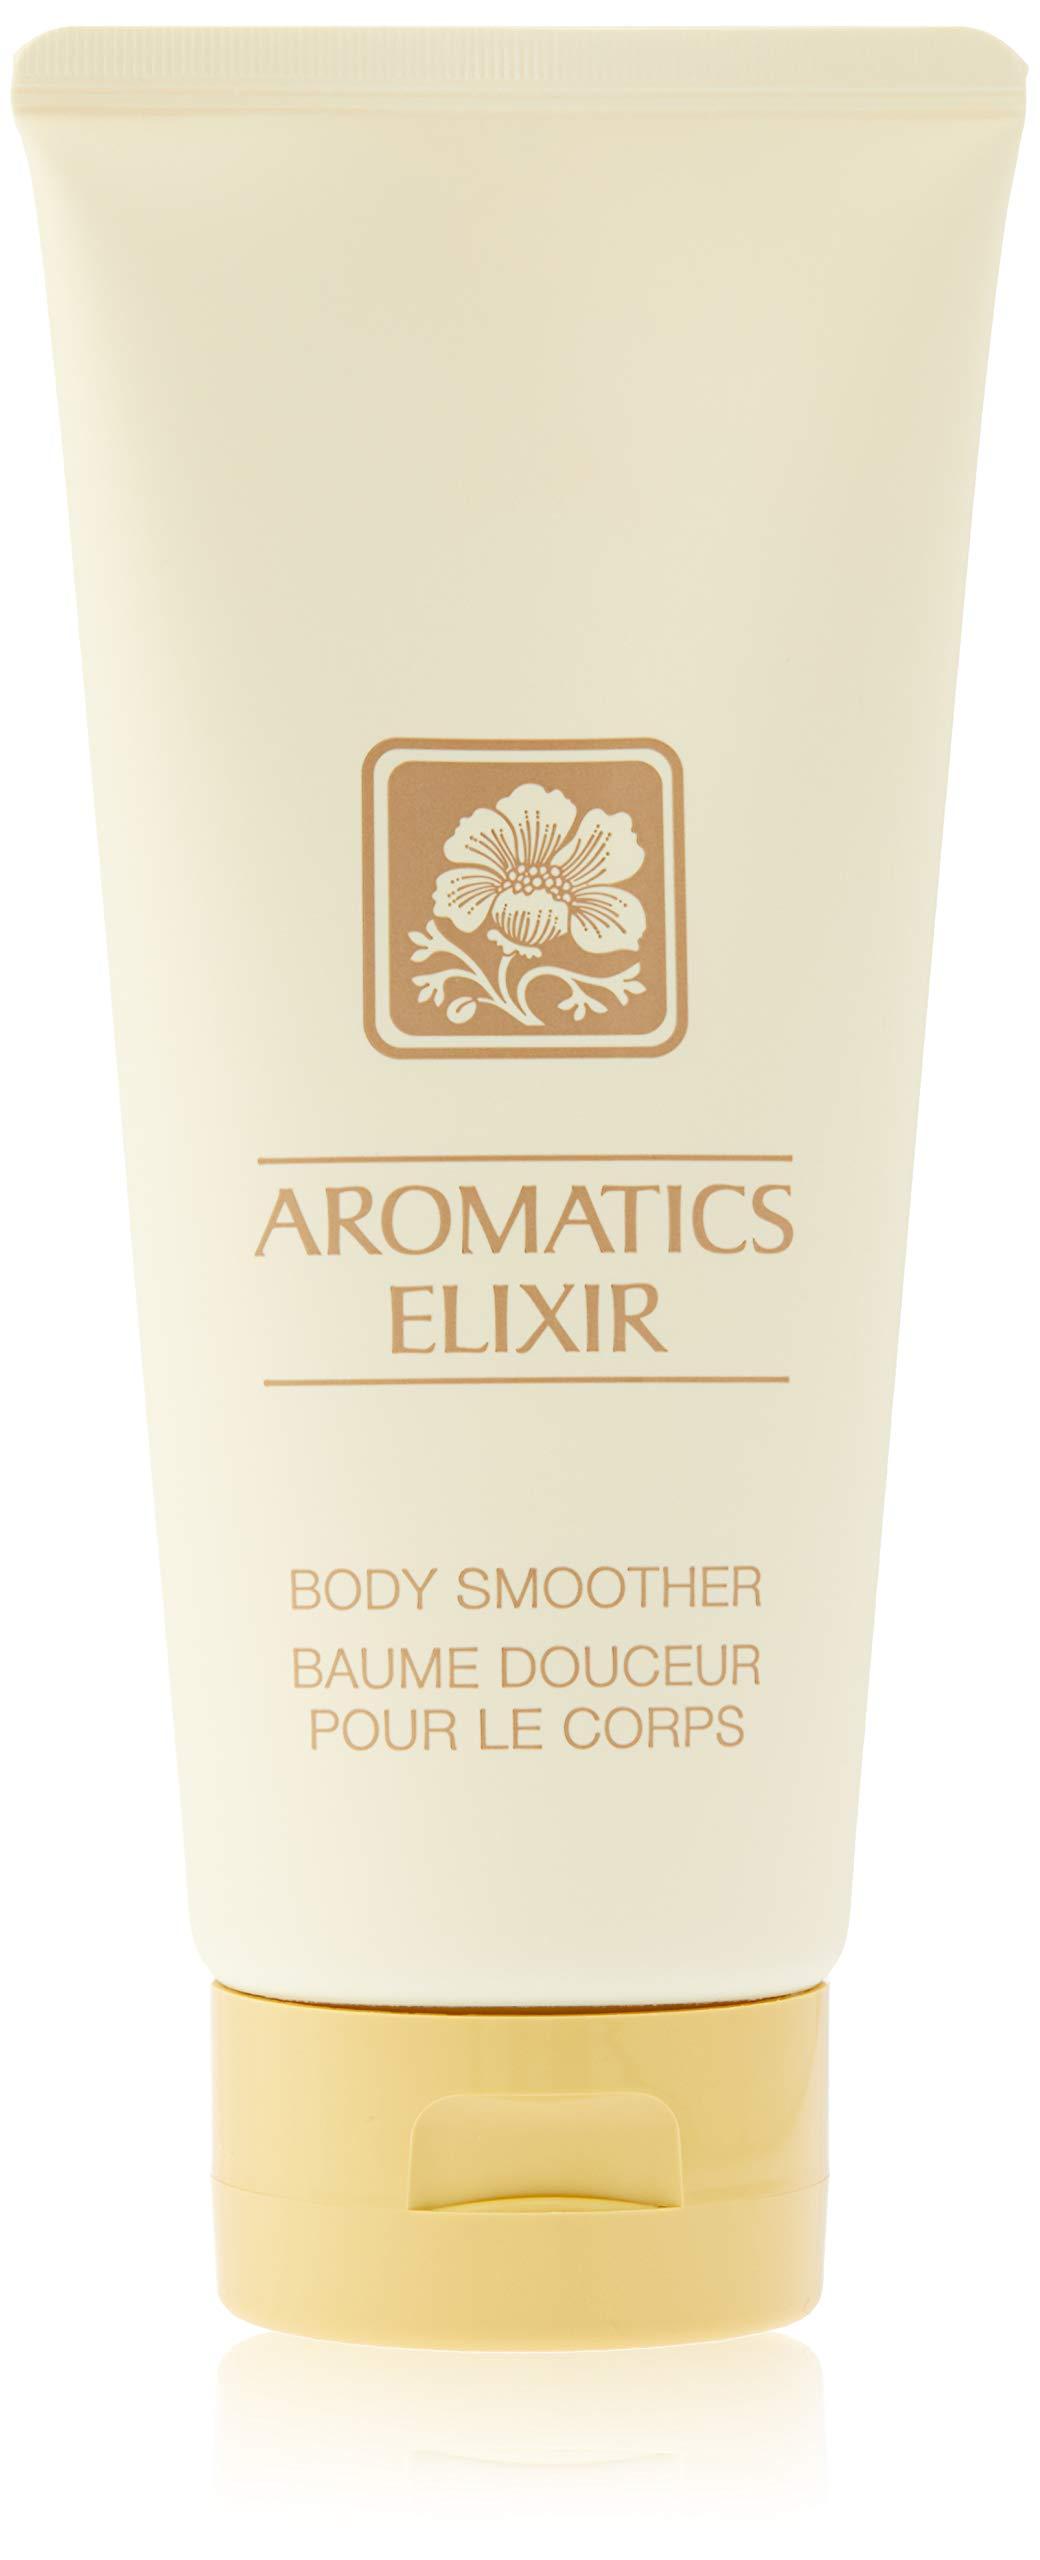 Amazoncom Aromatic Elixir Parfum Spray For Women By Clinique 34